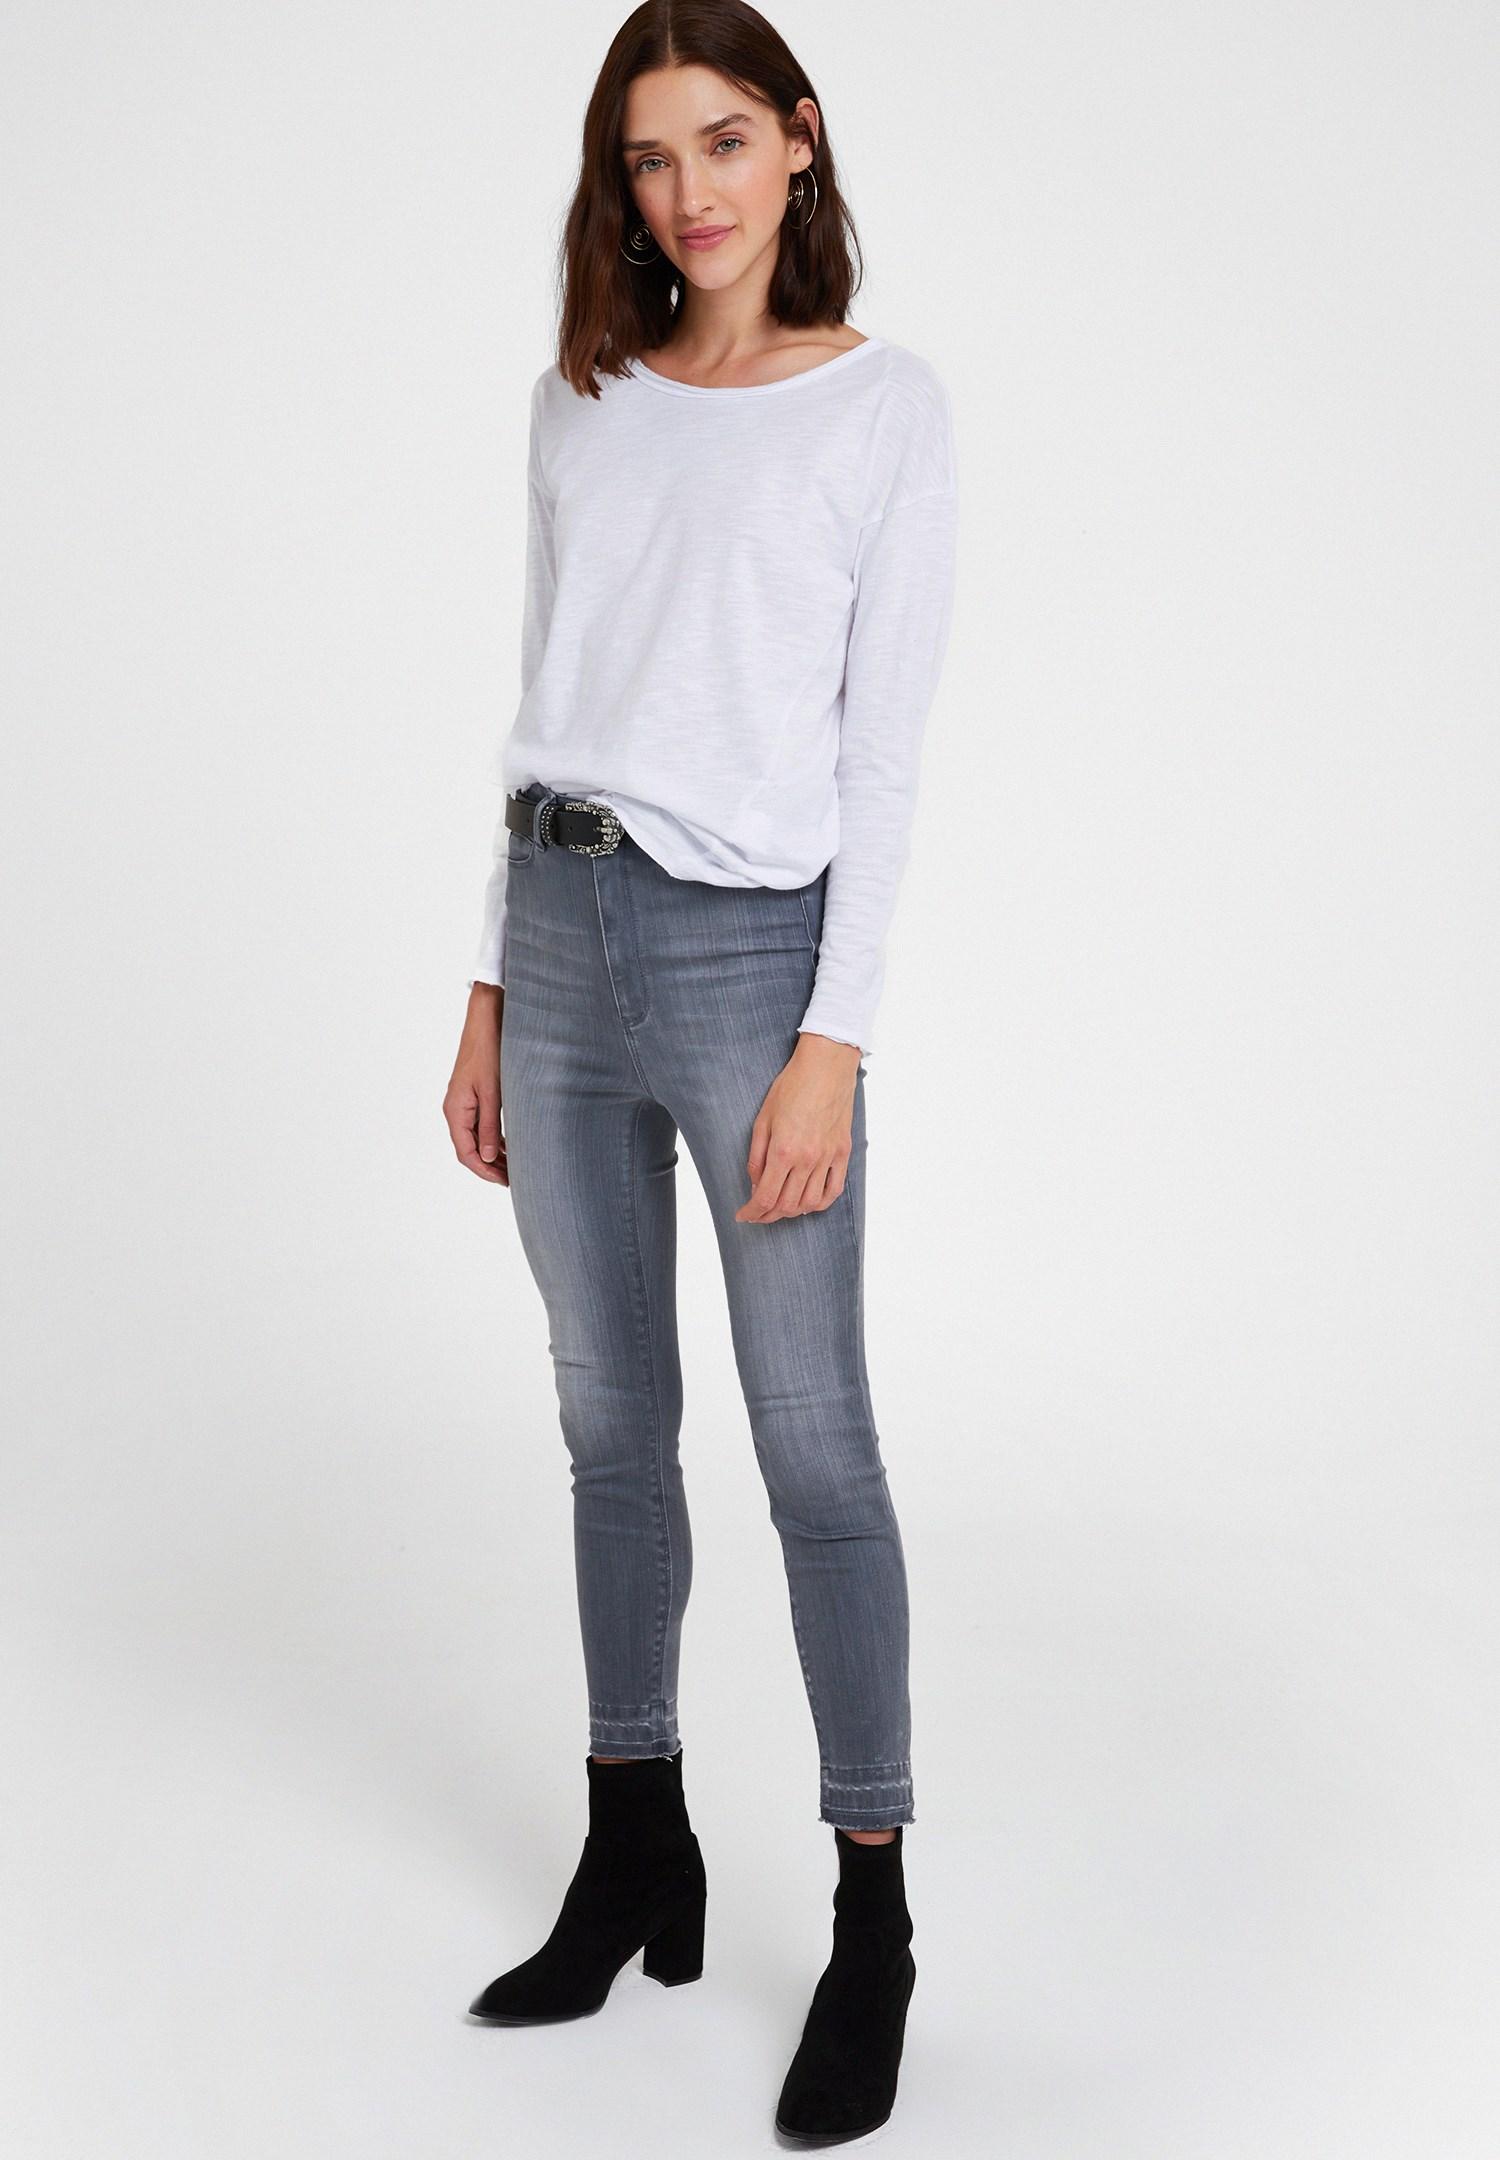 Bayan Beyaz Bisiklet Yaka Pamuklu Tişört